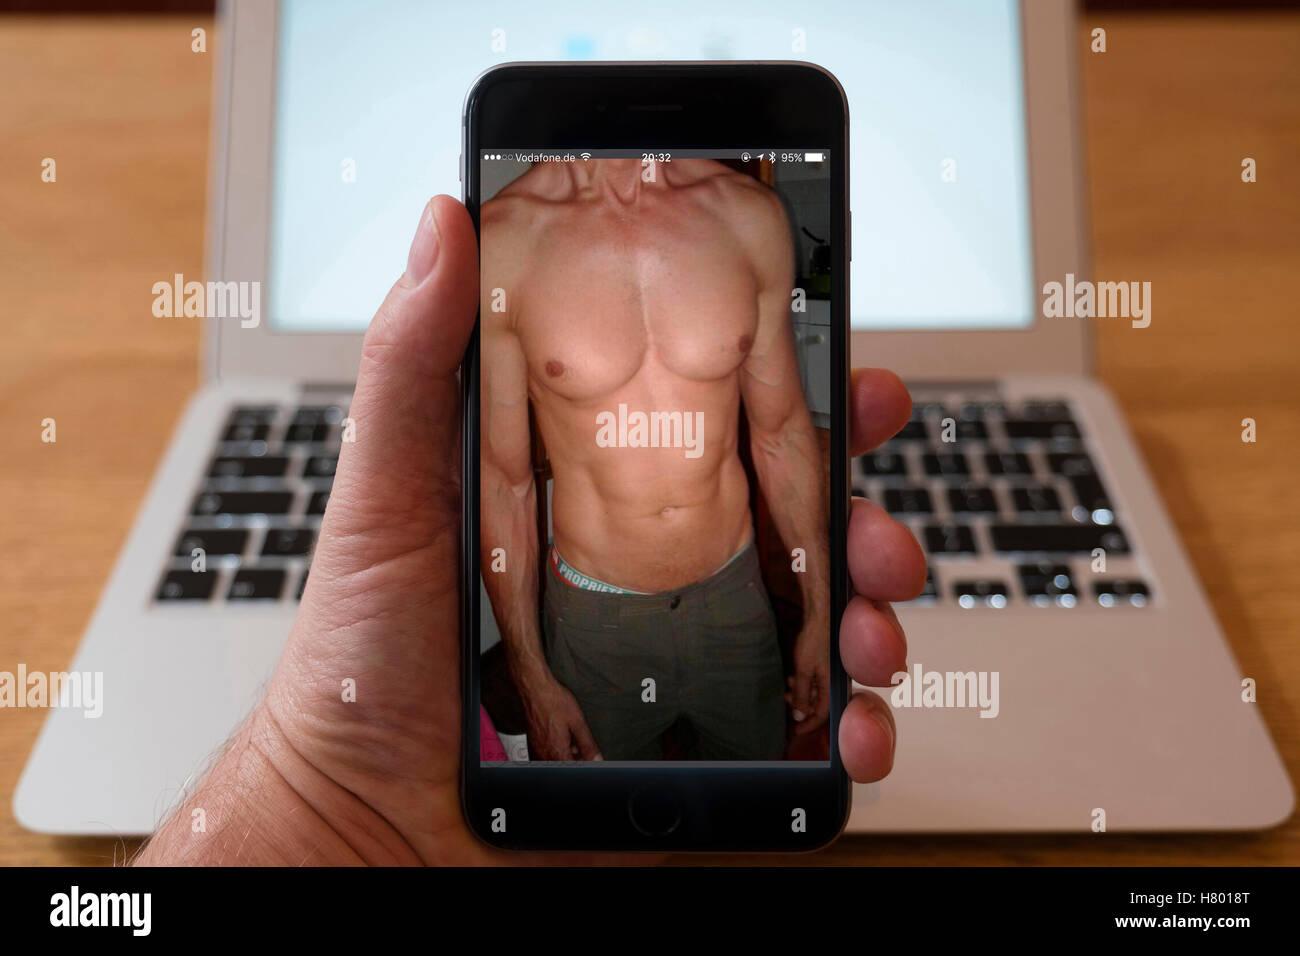 Gay Dating App Allemagne